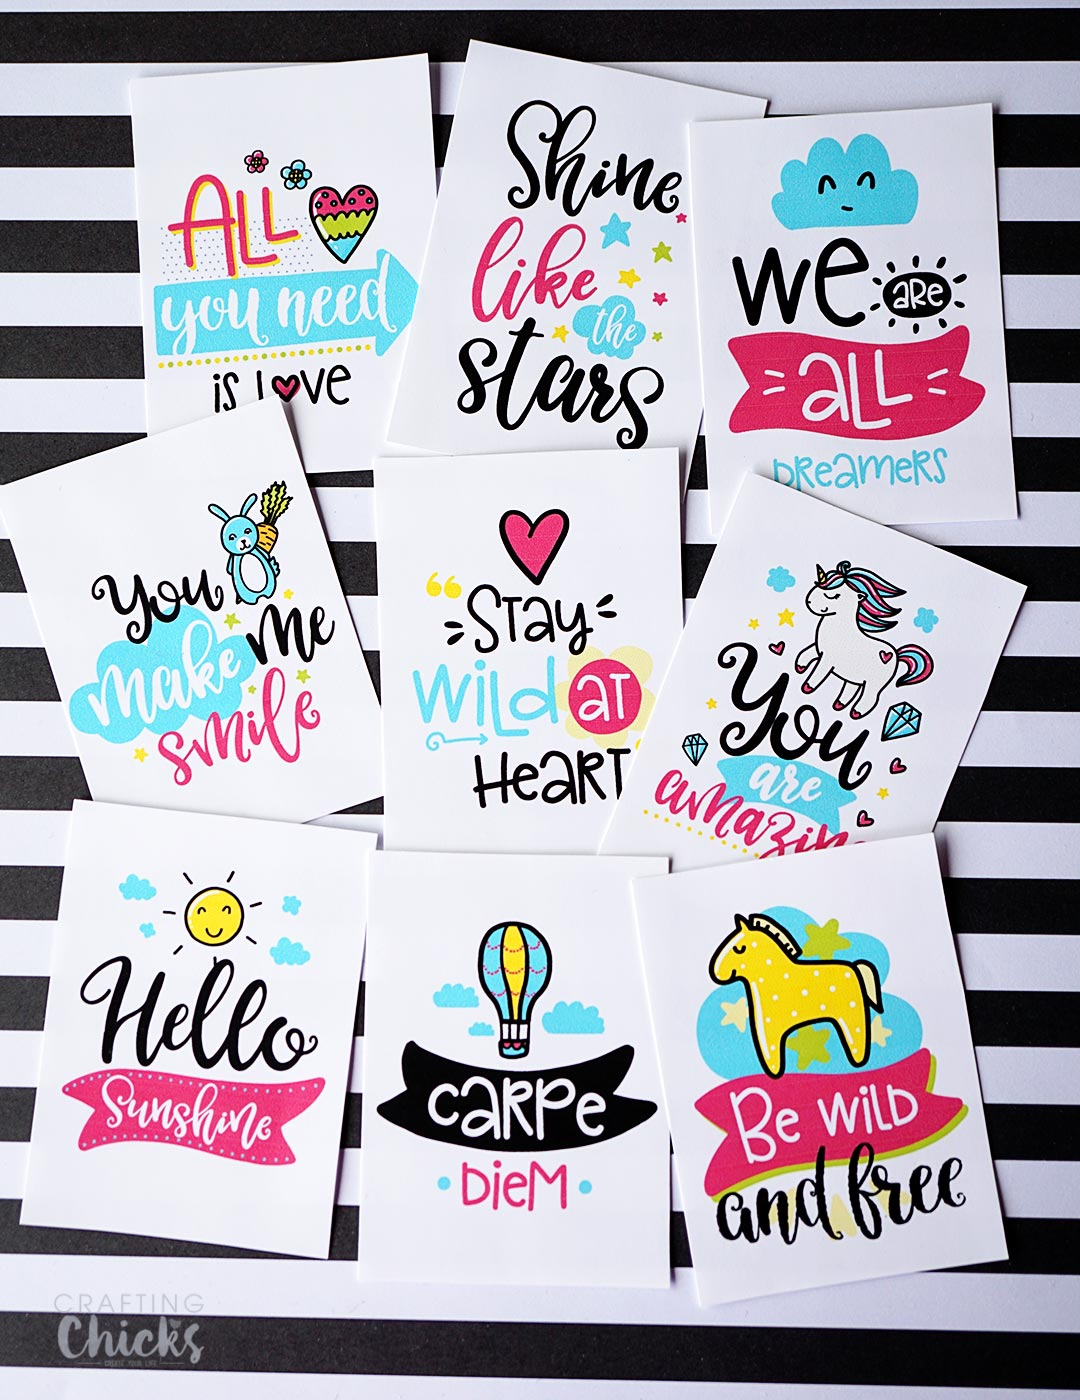 image regarding Kindness Cards Printable named Random Functions Printable Kindness Playing cards - The Composing Chicks